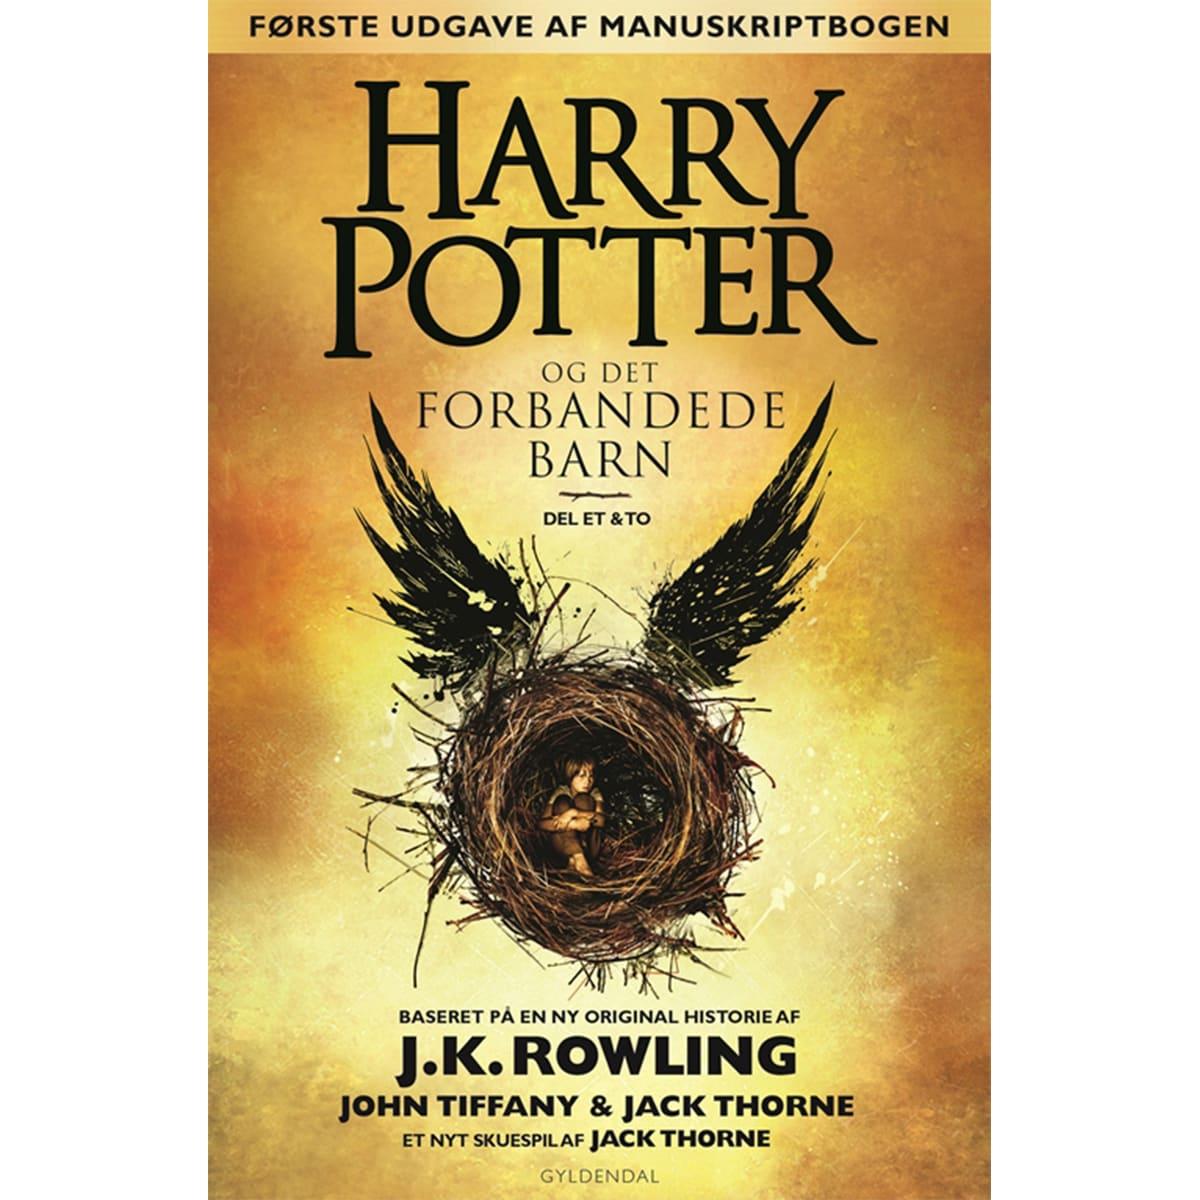 Af J.K. Rowling, John Tiffany & Jack Thorne